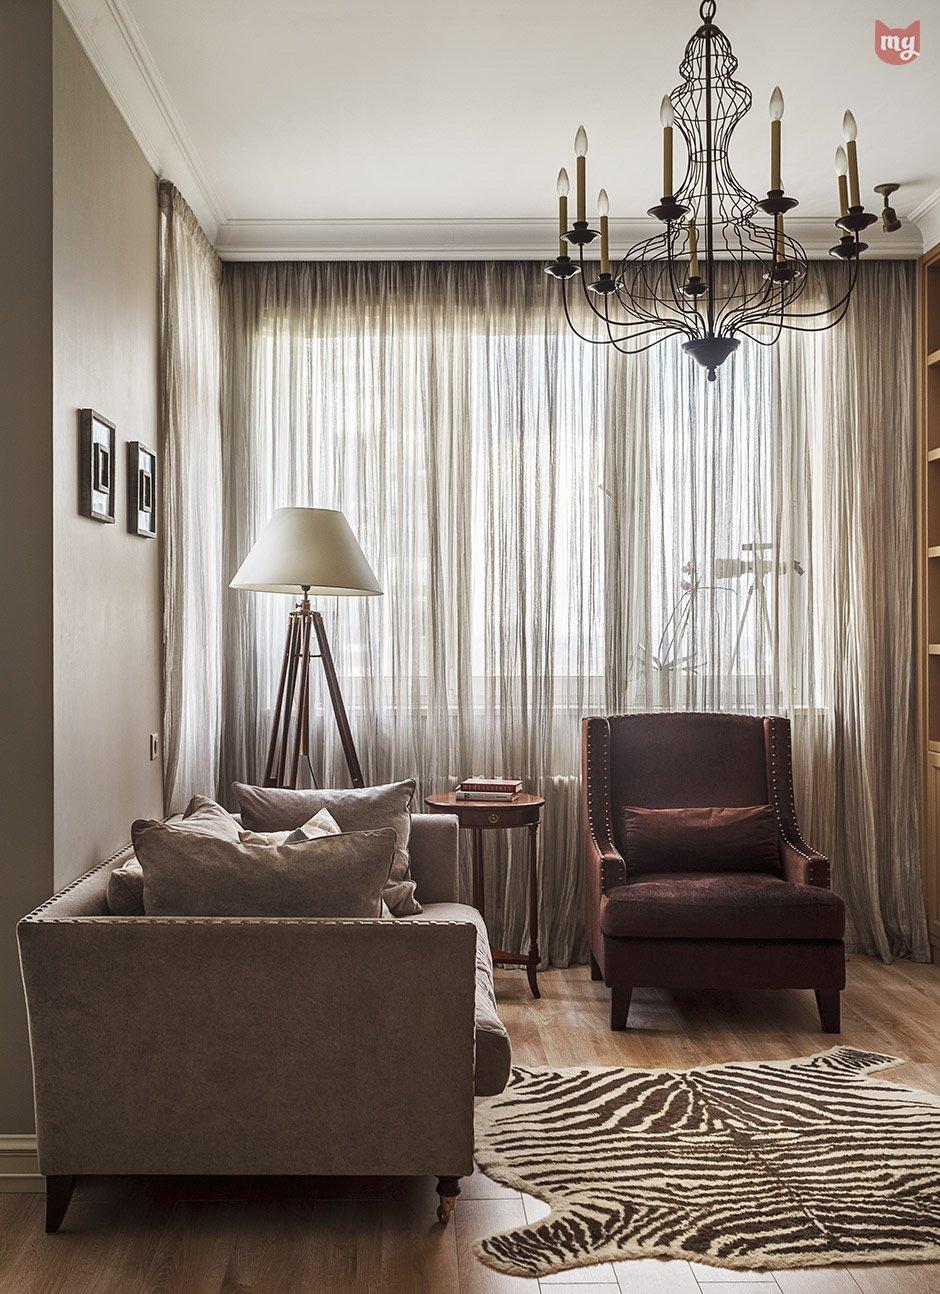 Фотография: Гостиная в стиле Прованс и Кантри, Квартира, Проект недели, Наталья Сорокина – фото на INMYROOM